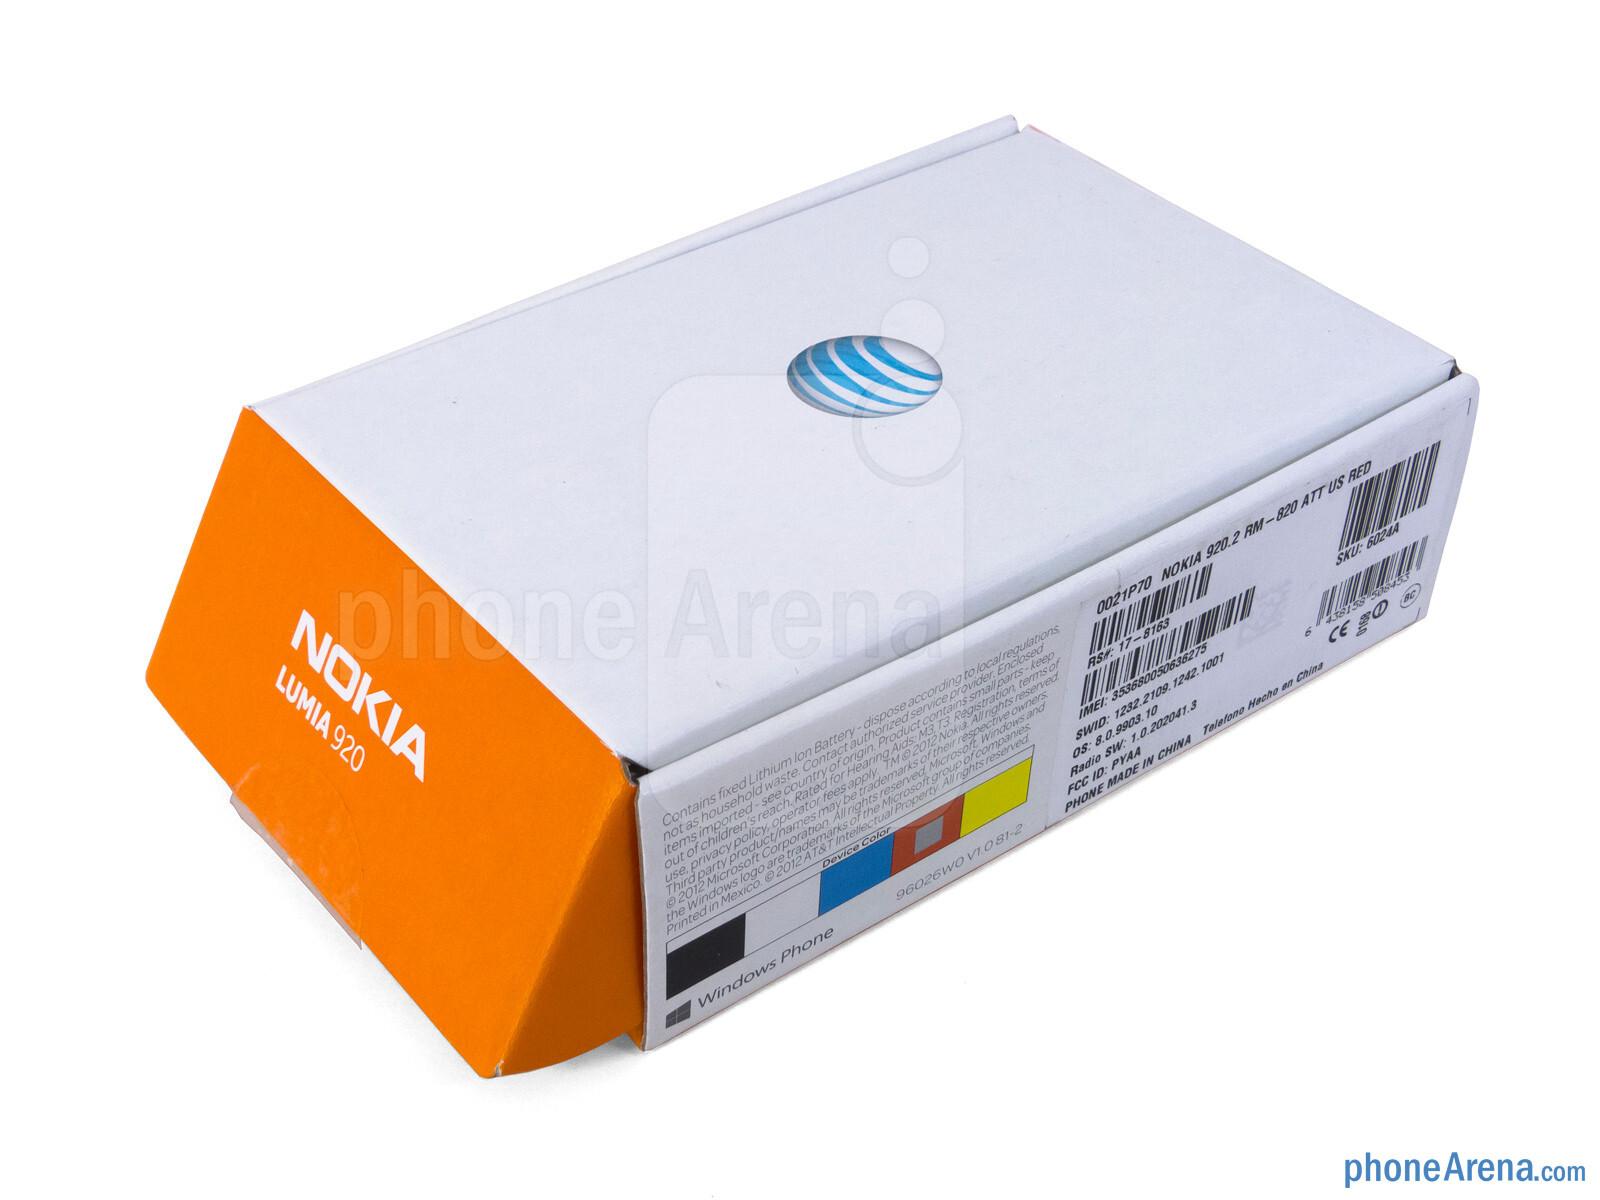 Nokia Lumia 920 Review - PhoneArena